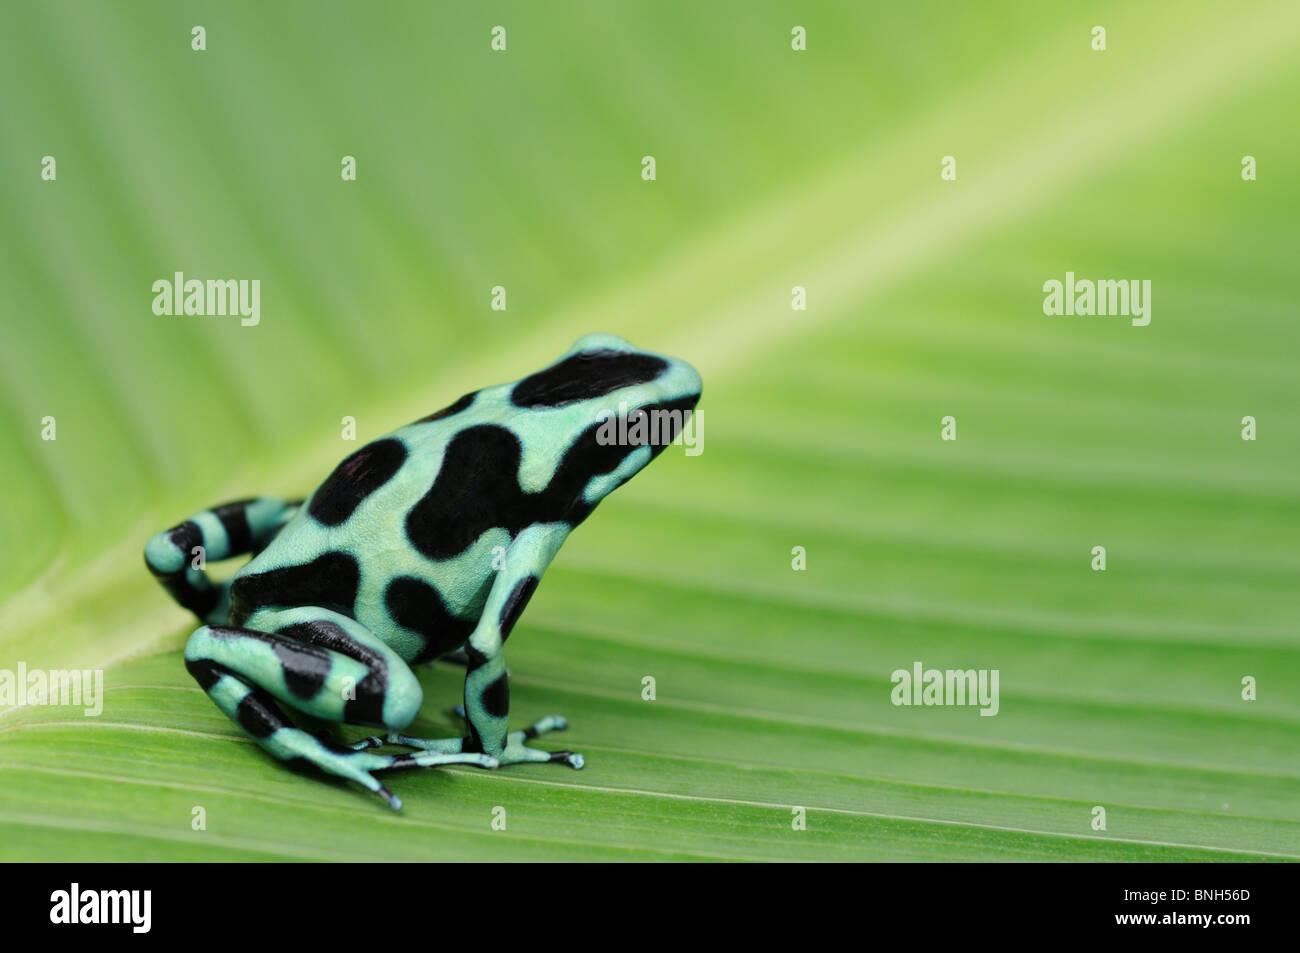 Verde y negro rana venenosa, Dendrobates auratus, en la selva, Chilamate, Costa Rica Foto de stock